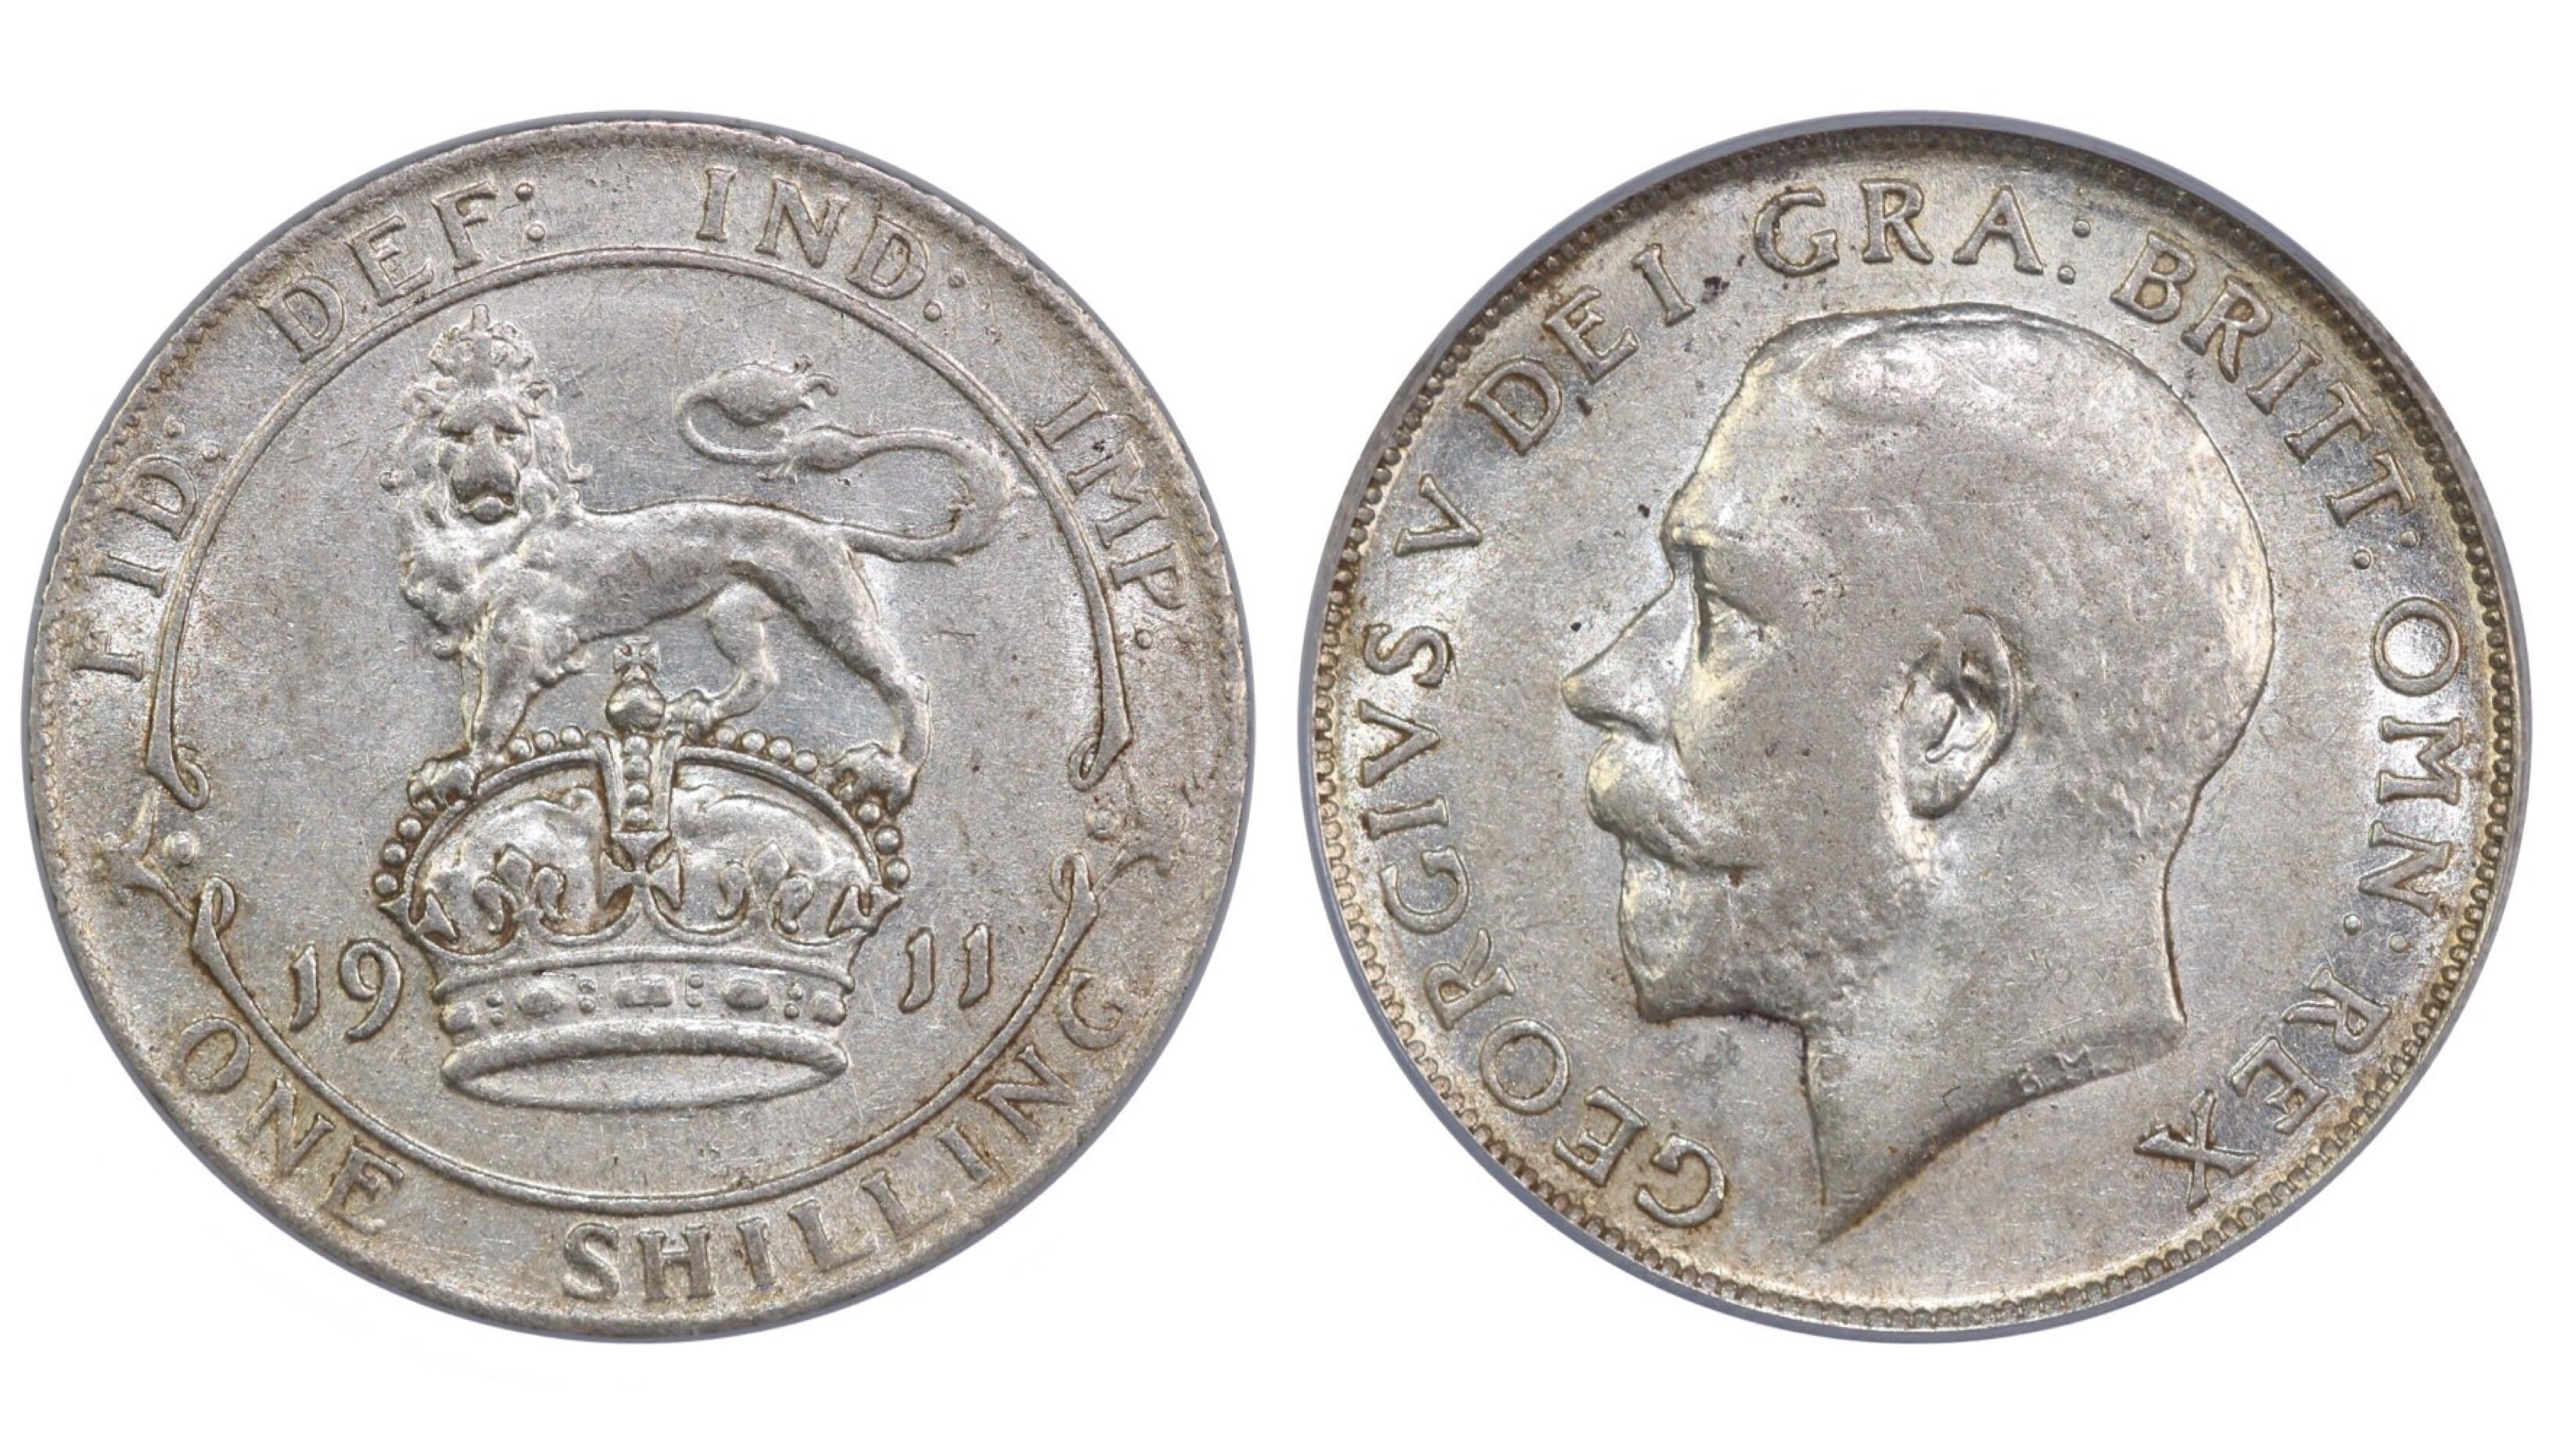 1911 Shilling, CGS 55, Dies 3A, Davies 1792, 25727 - Auctio